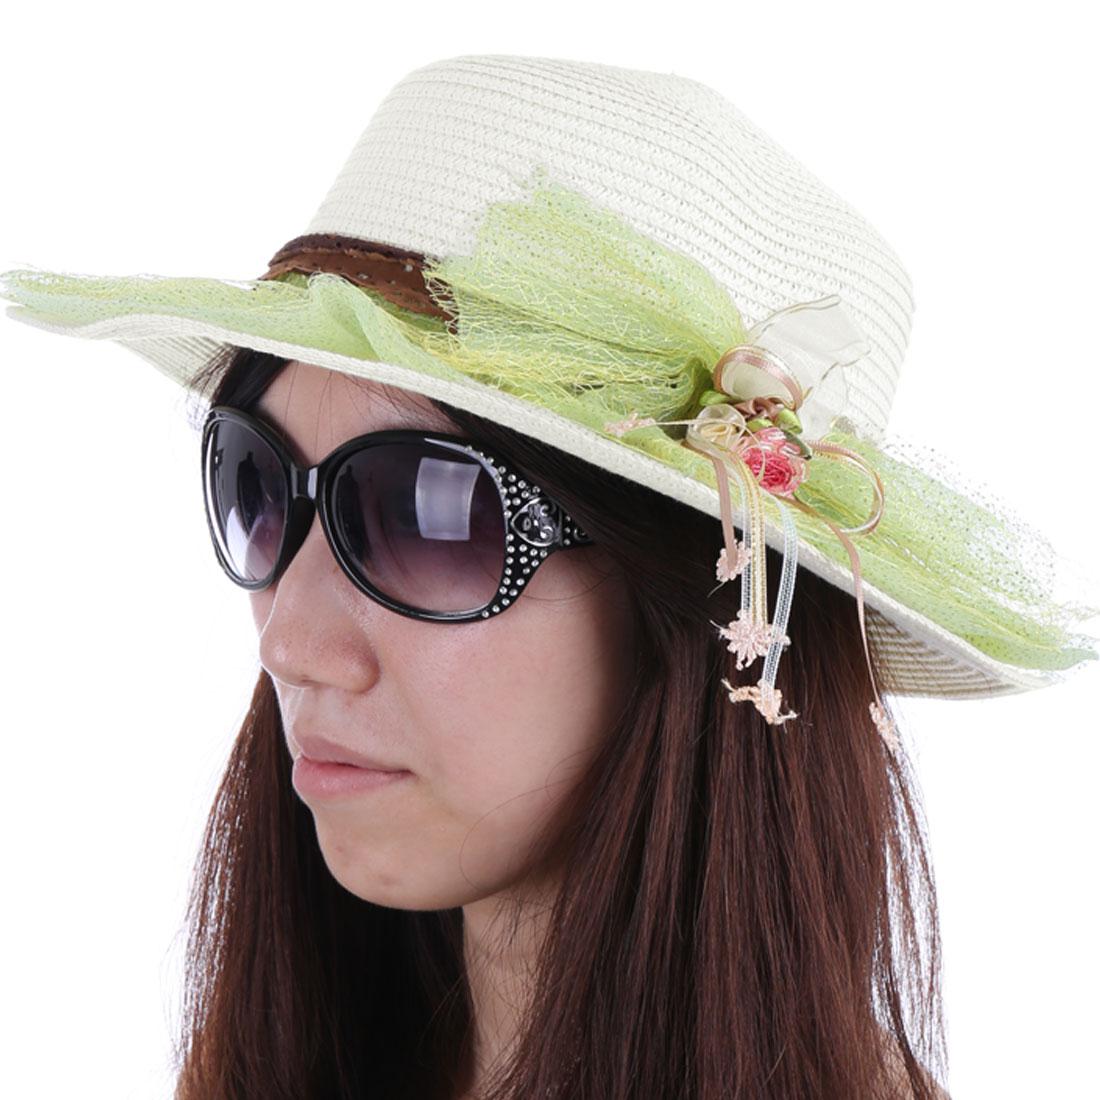 Women Chic Wide Brim Light Green Mesh Covered White Sun Straw Hat